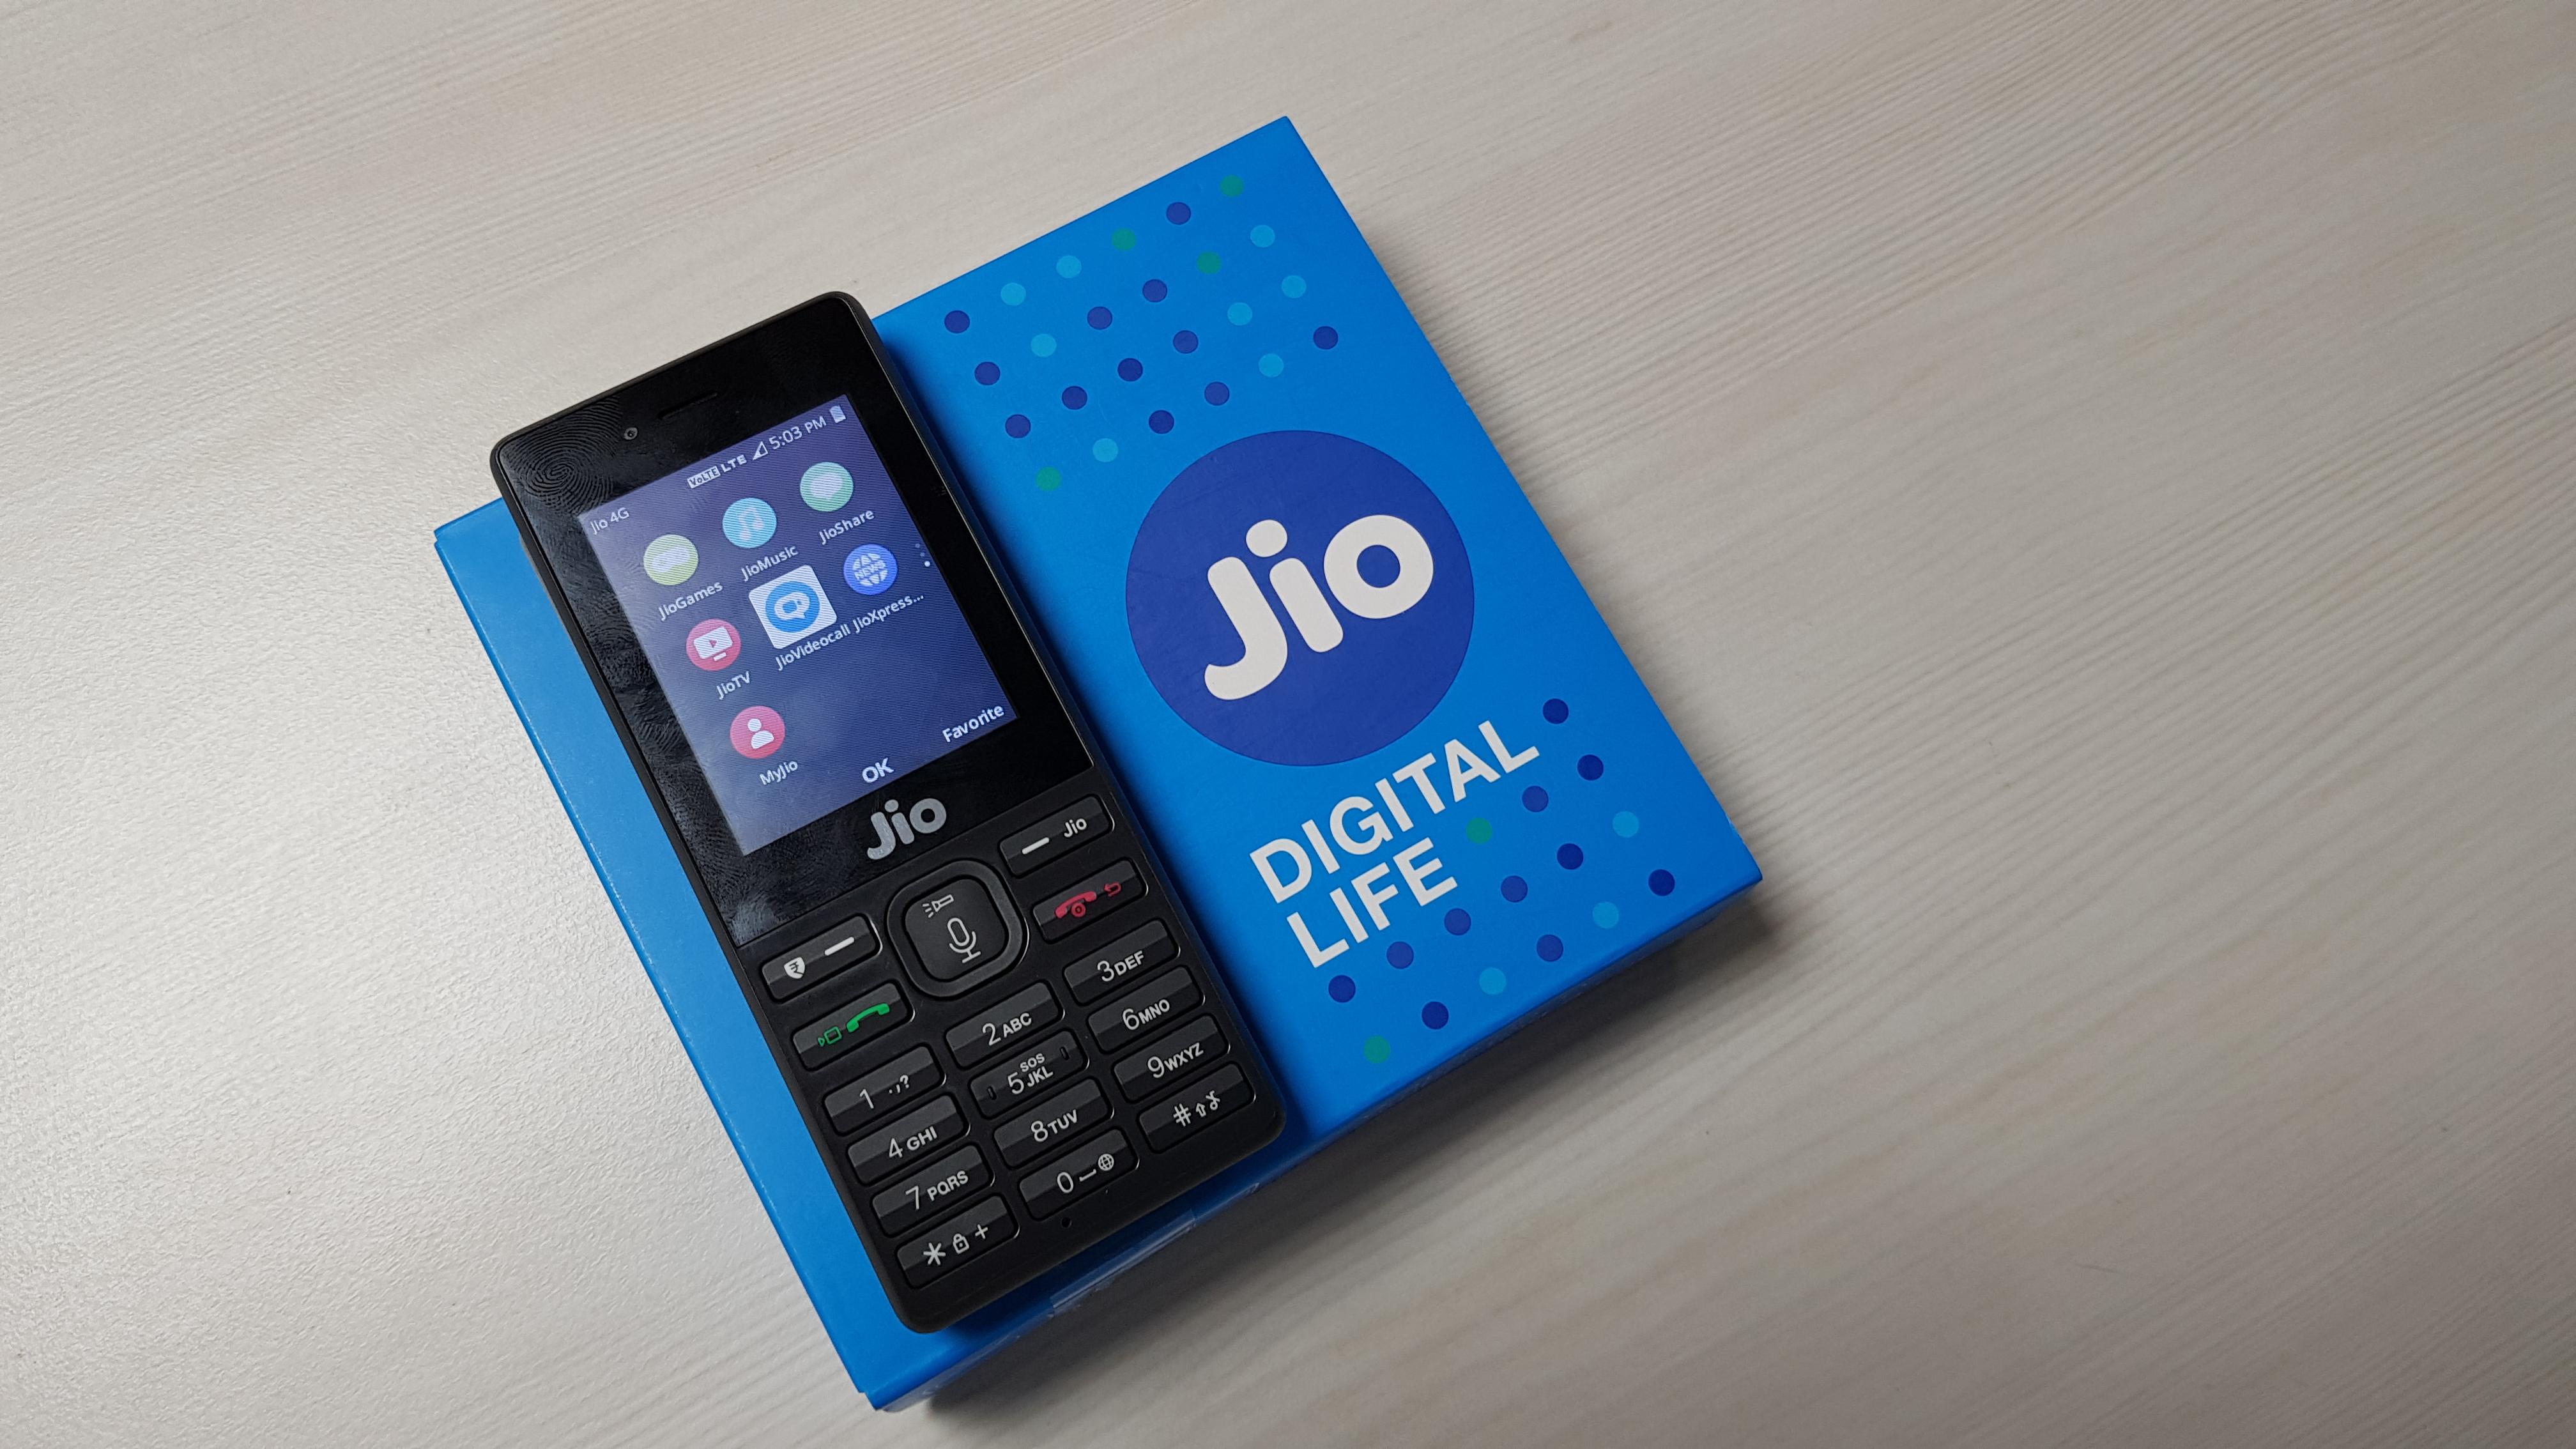 You can now buy the JioPhone from MobiKwik | TechRadar